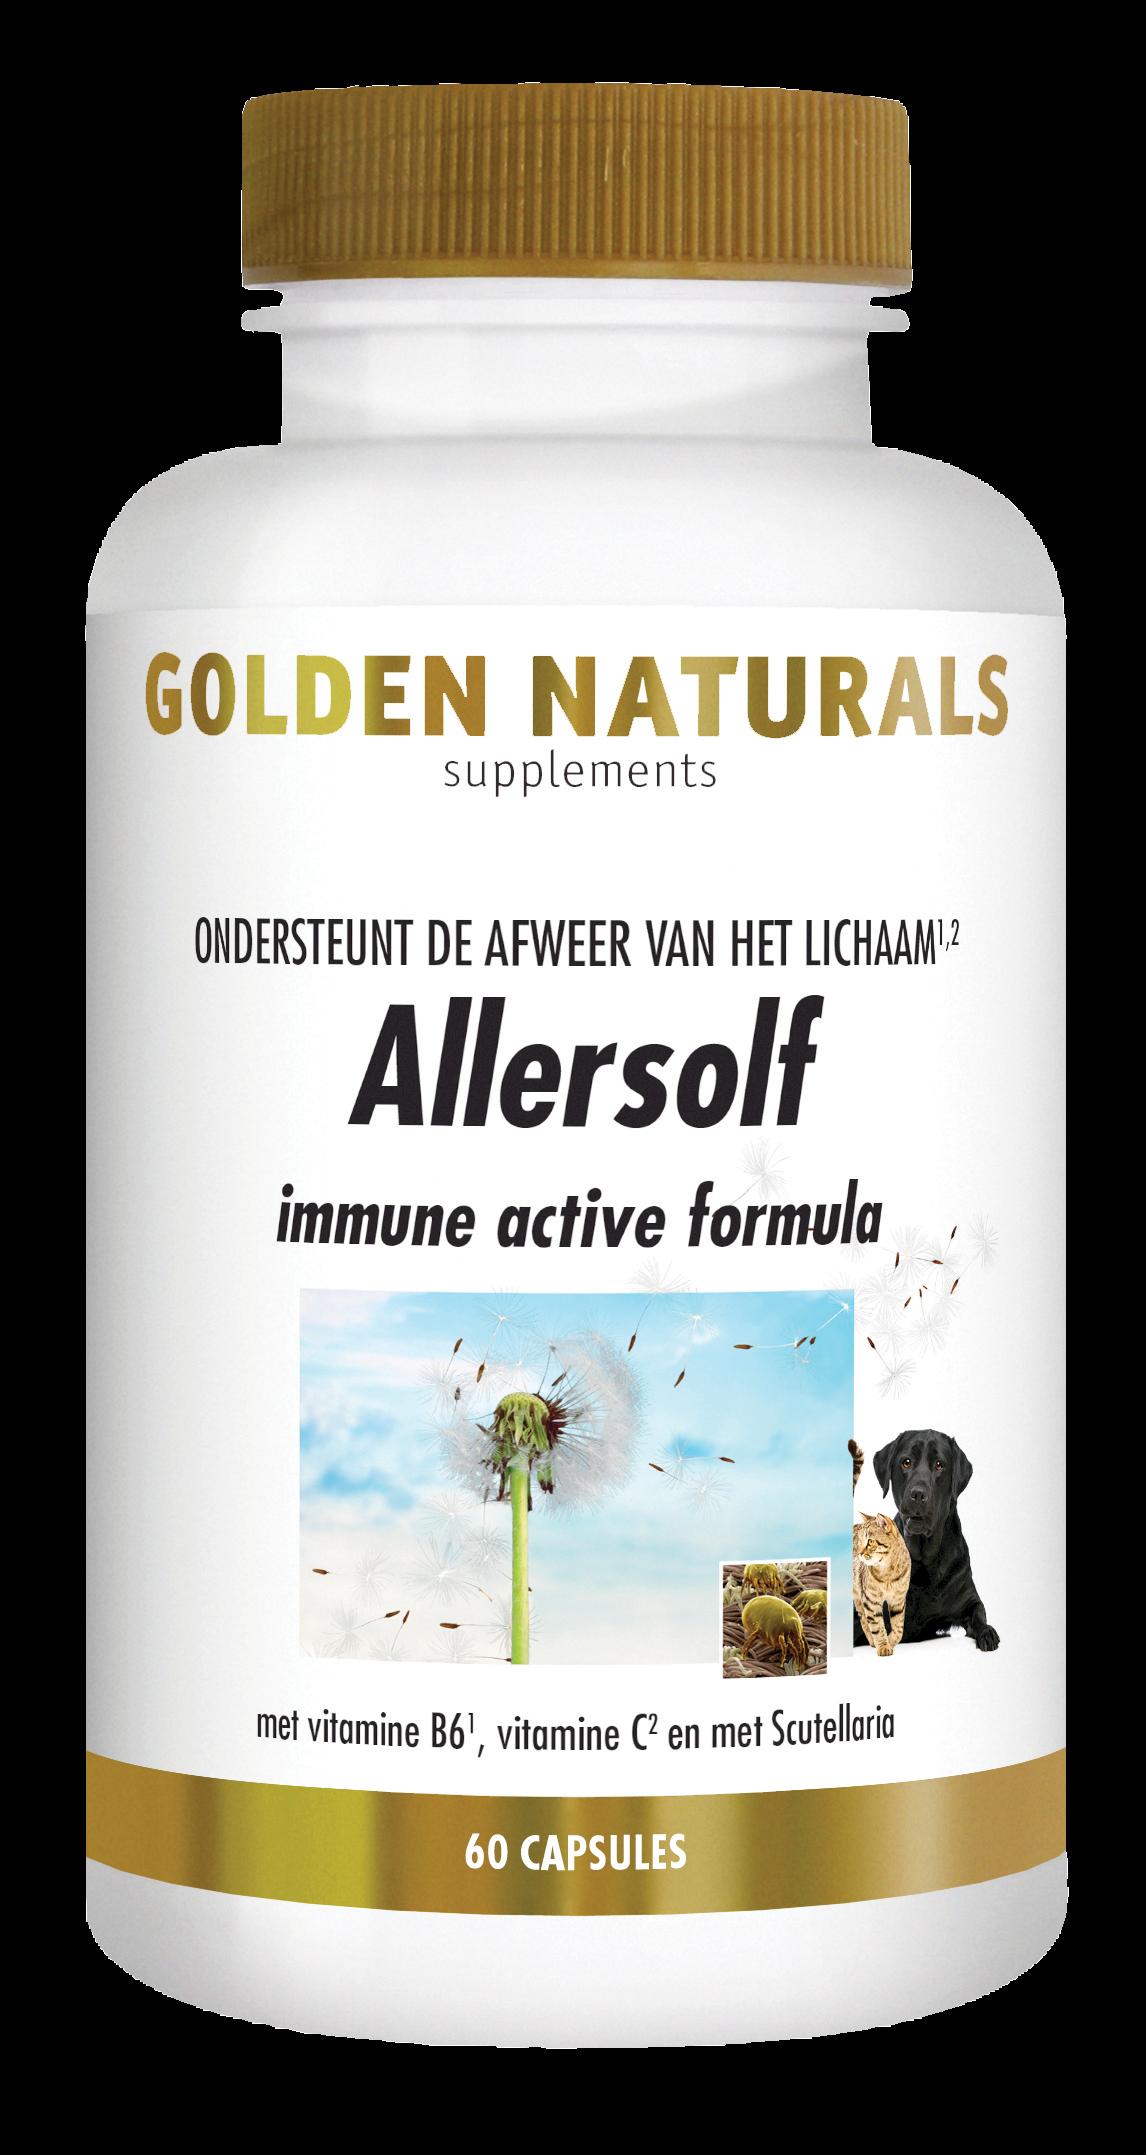 Golden Naturals Allersolf (60 capsules)